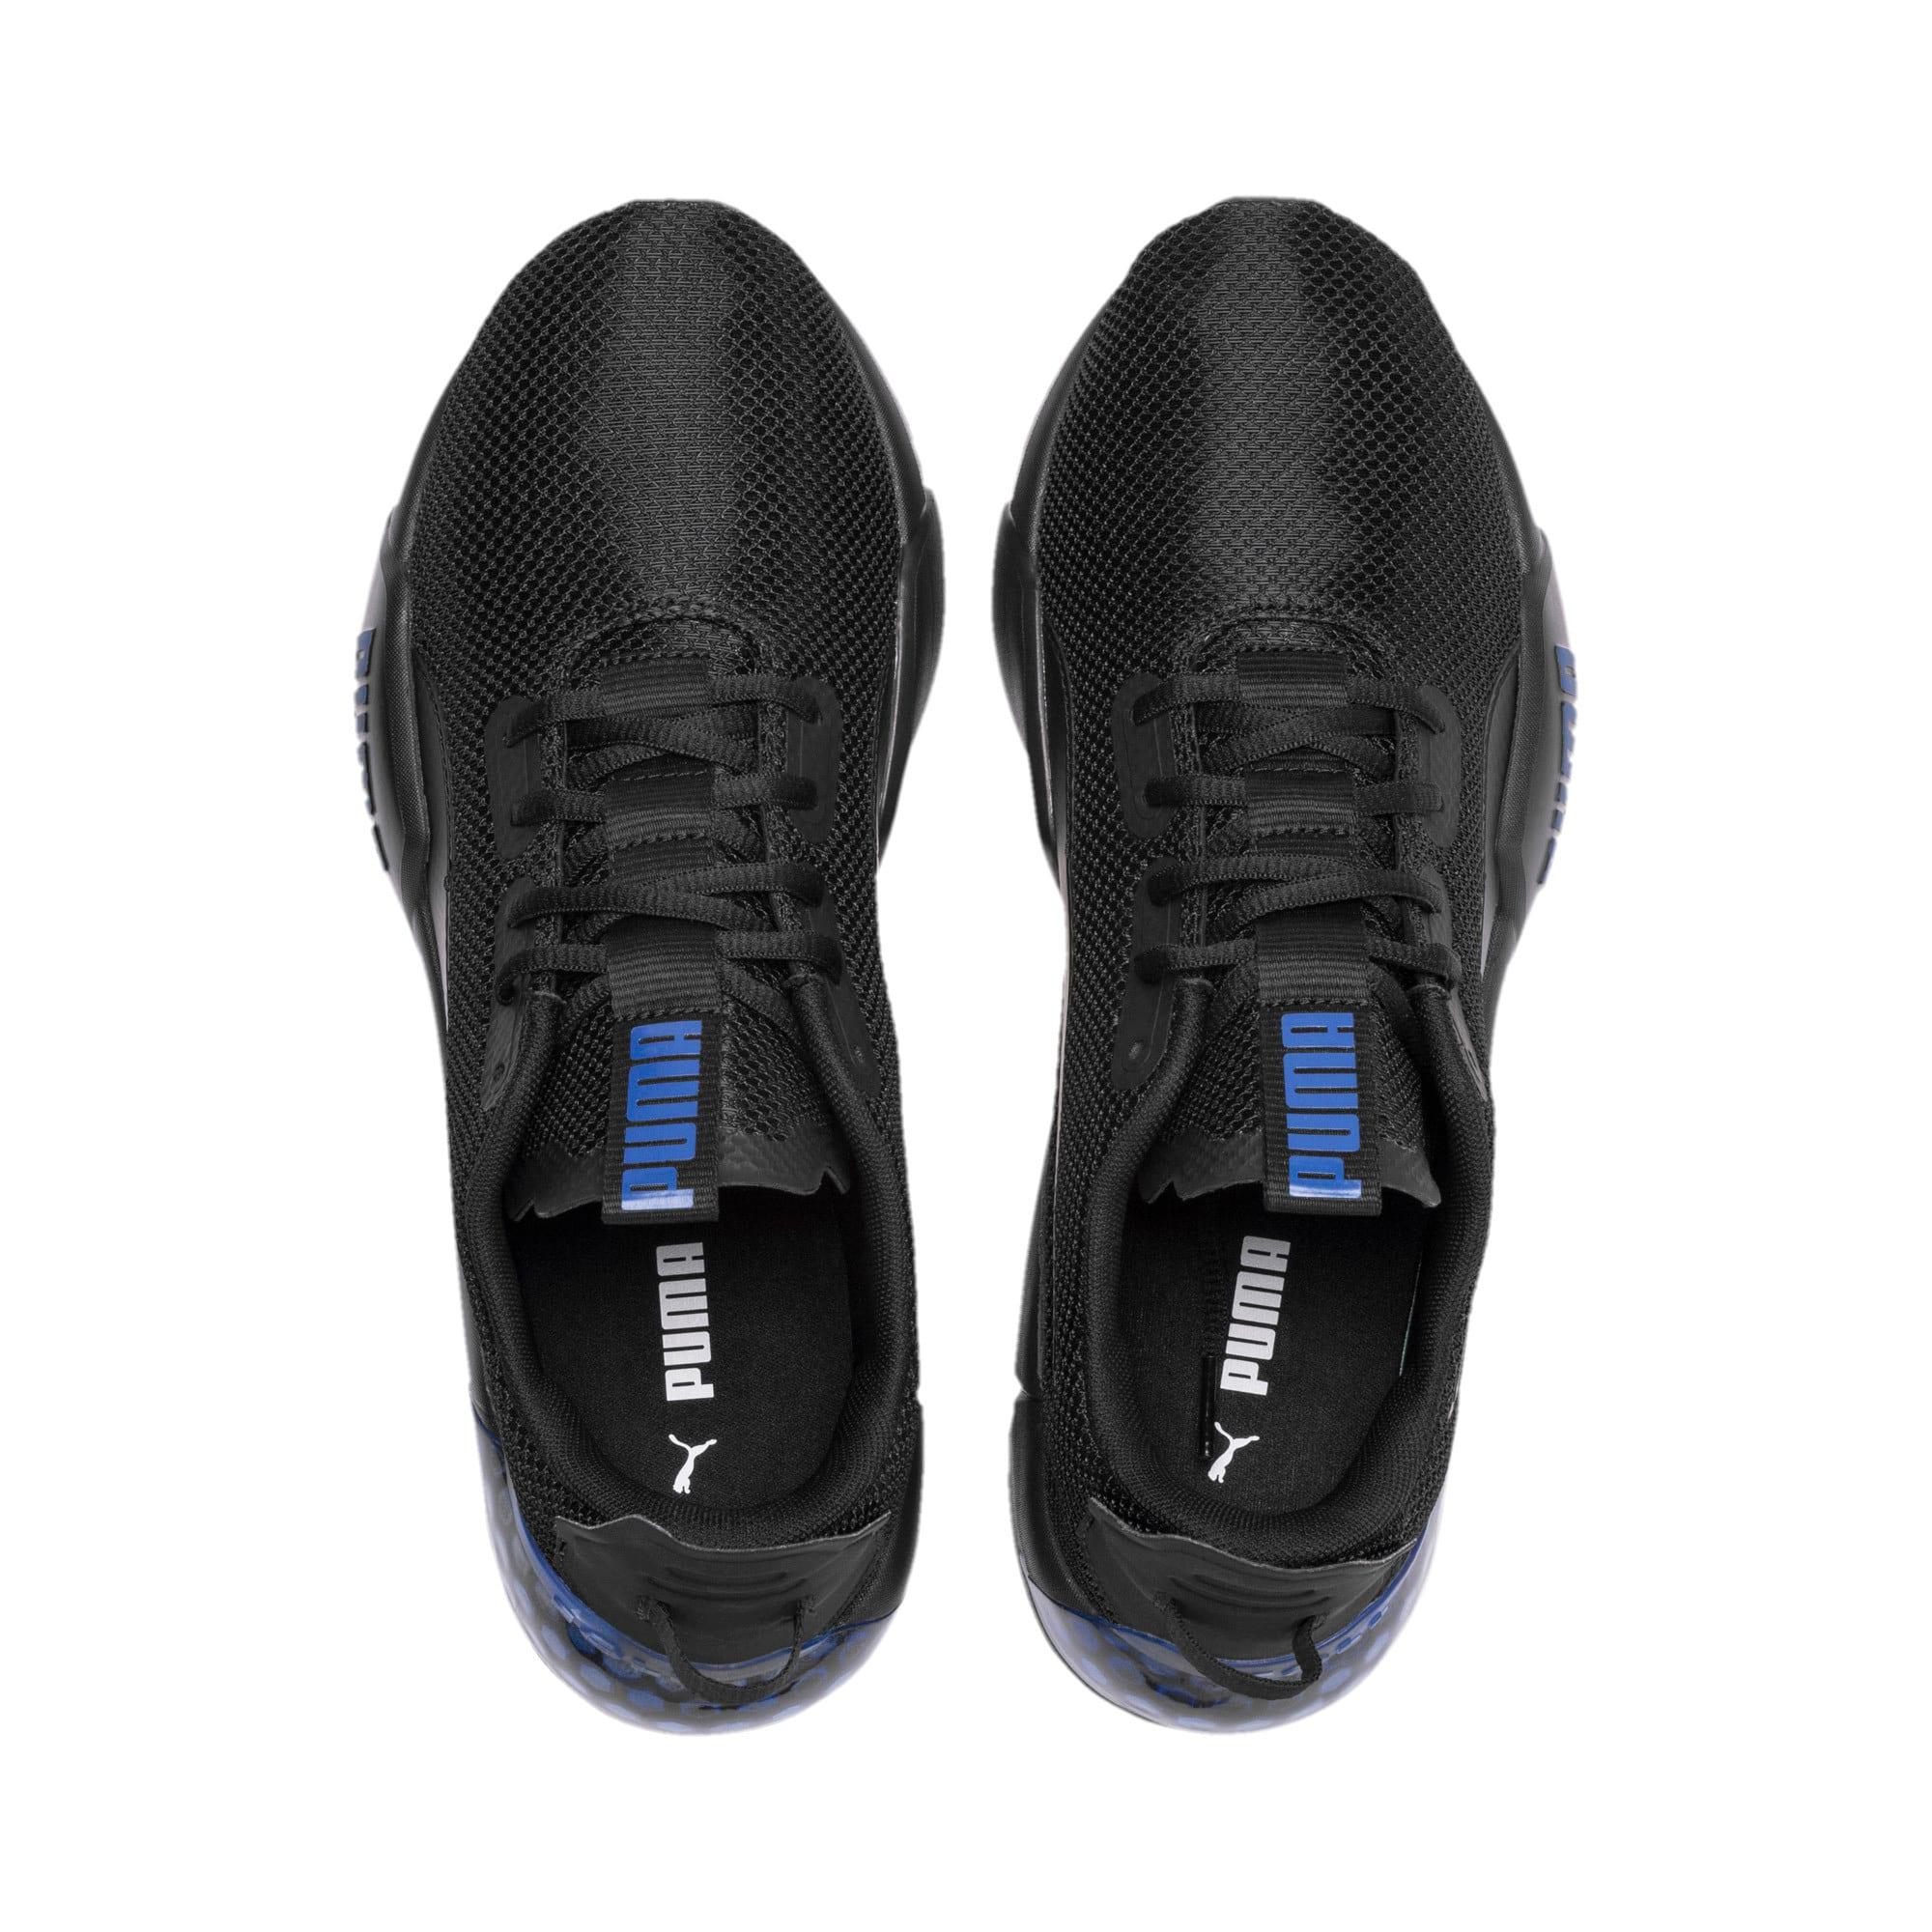 Thumbnail 7 of CELL Phase Men's Training Shoes, Puma Black-Galaxy Blue, medium